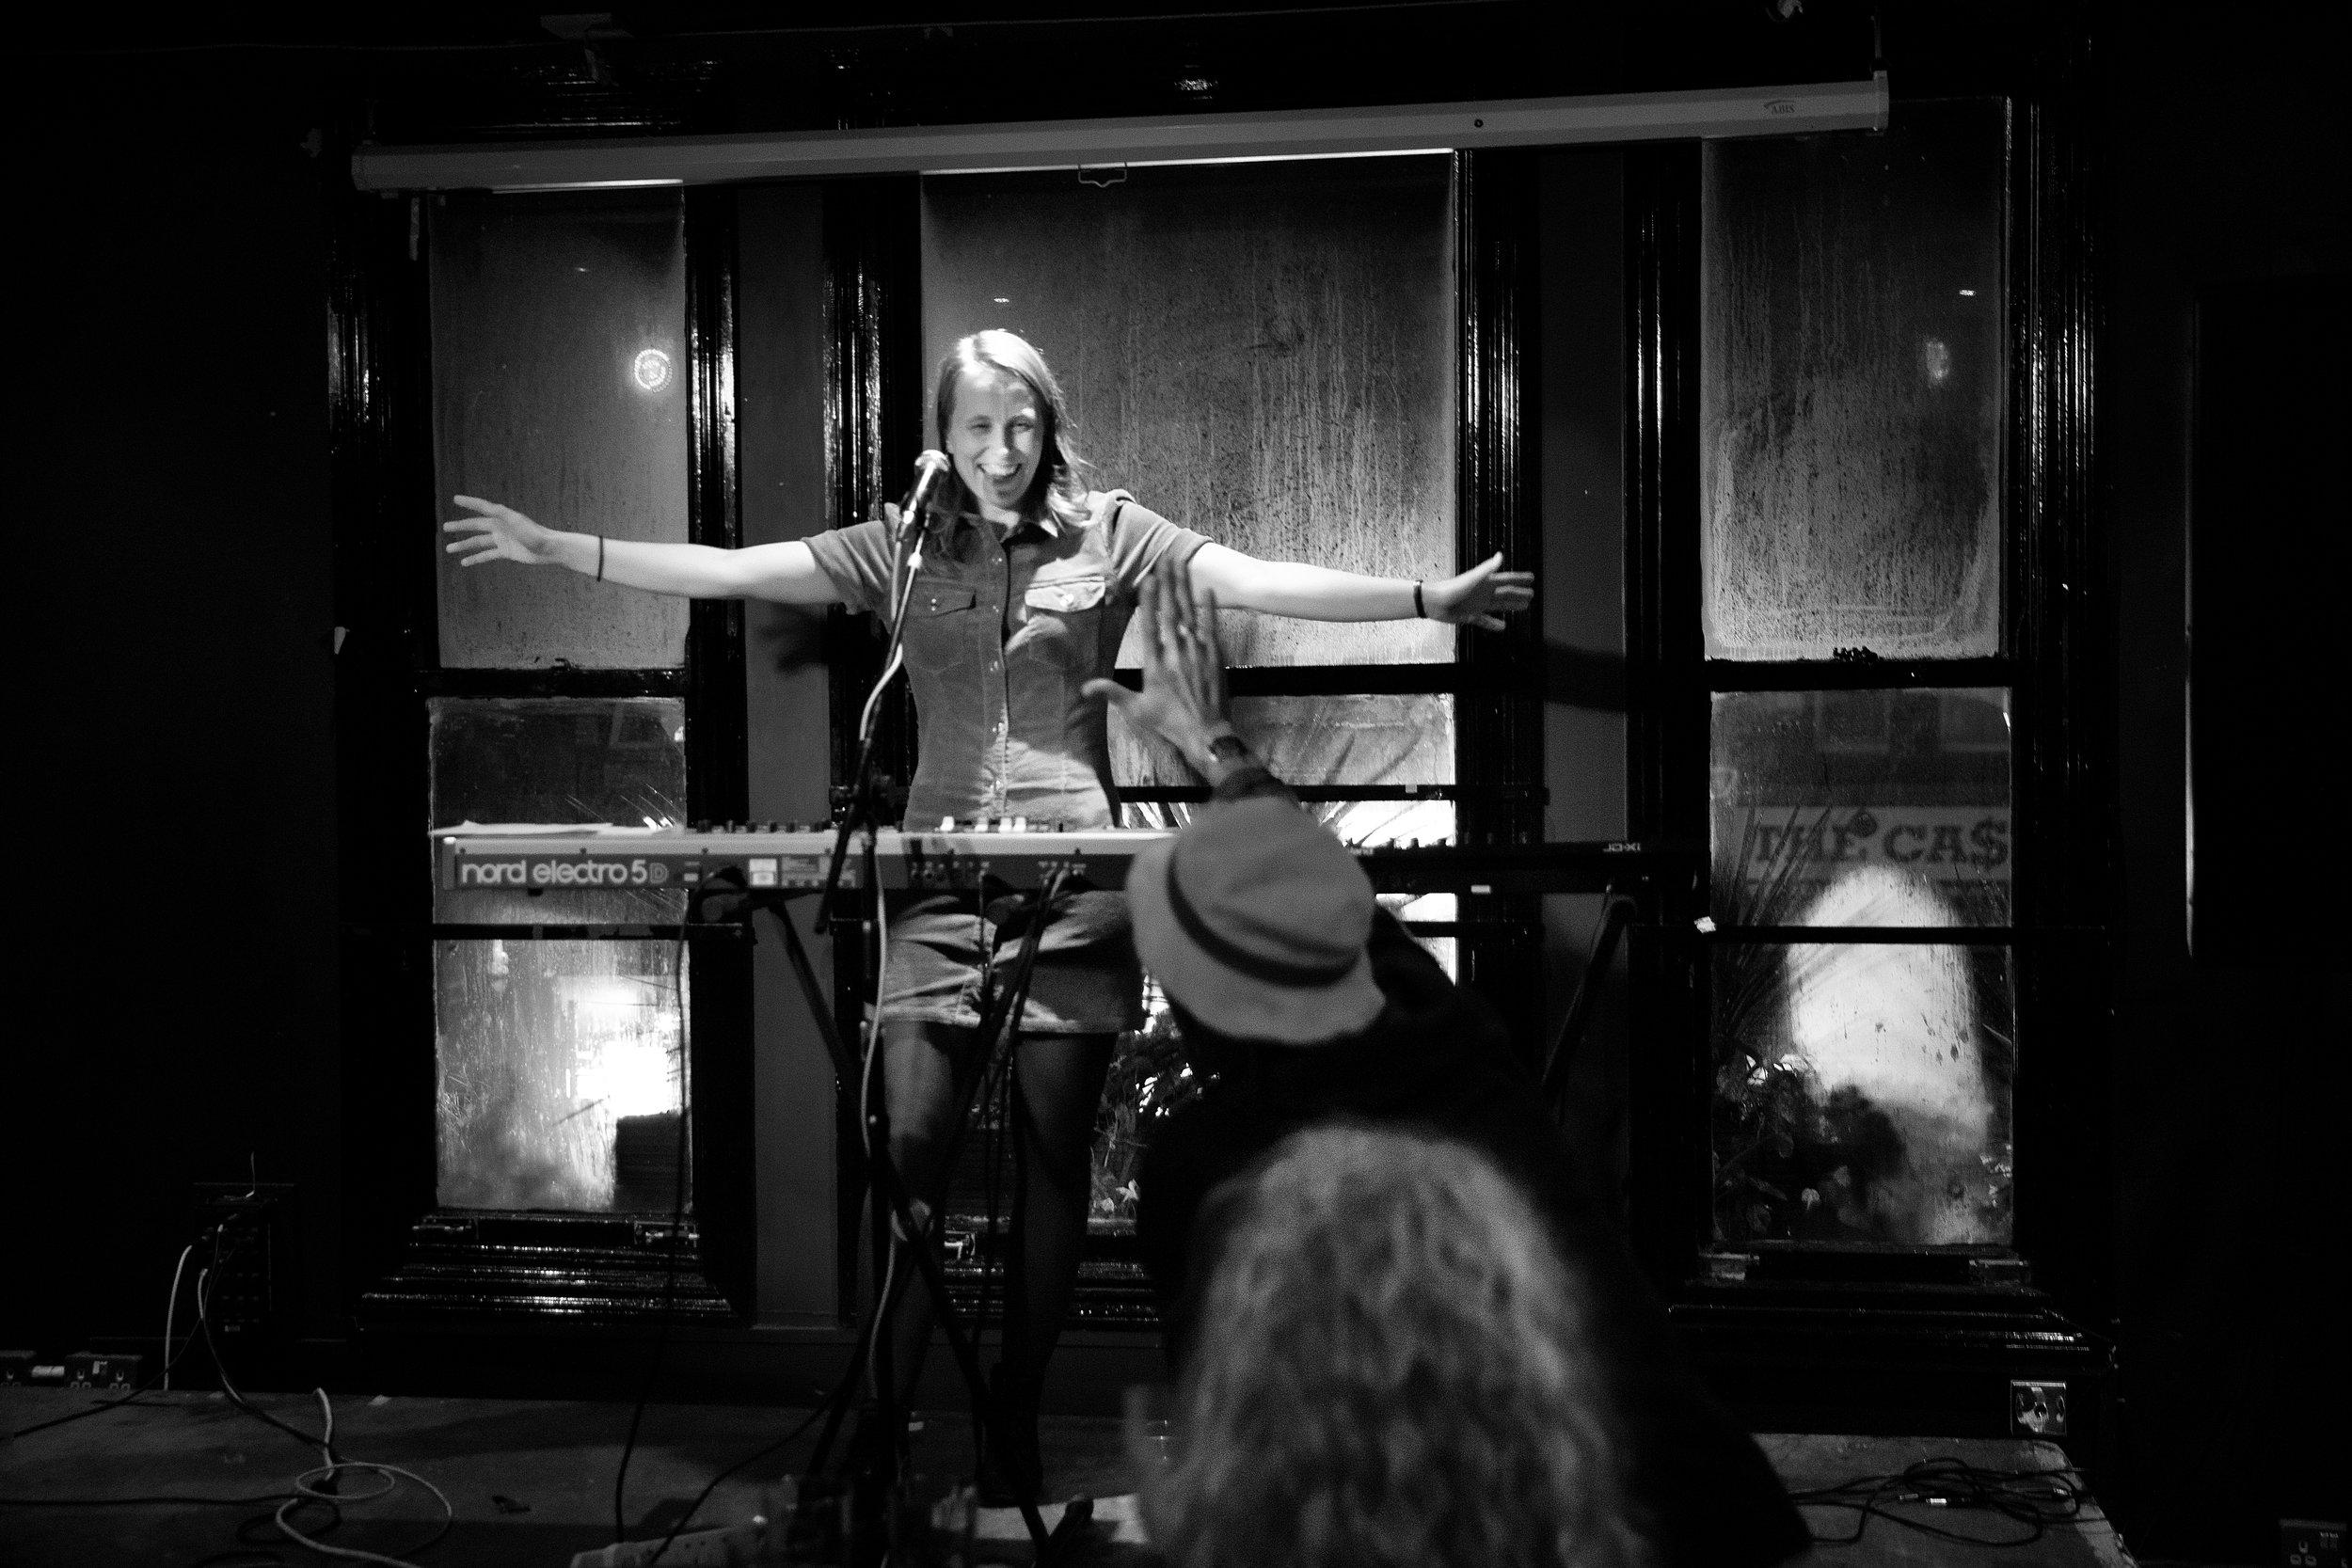 Cecilie Anna live at Dulcimer Bar, Chorlton Manchester, September 28. 2019 Photo: Paal Audestad